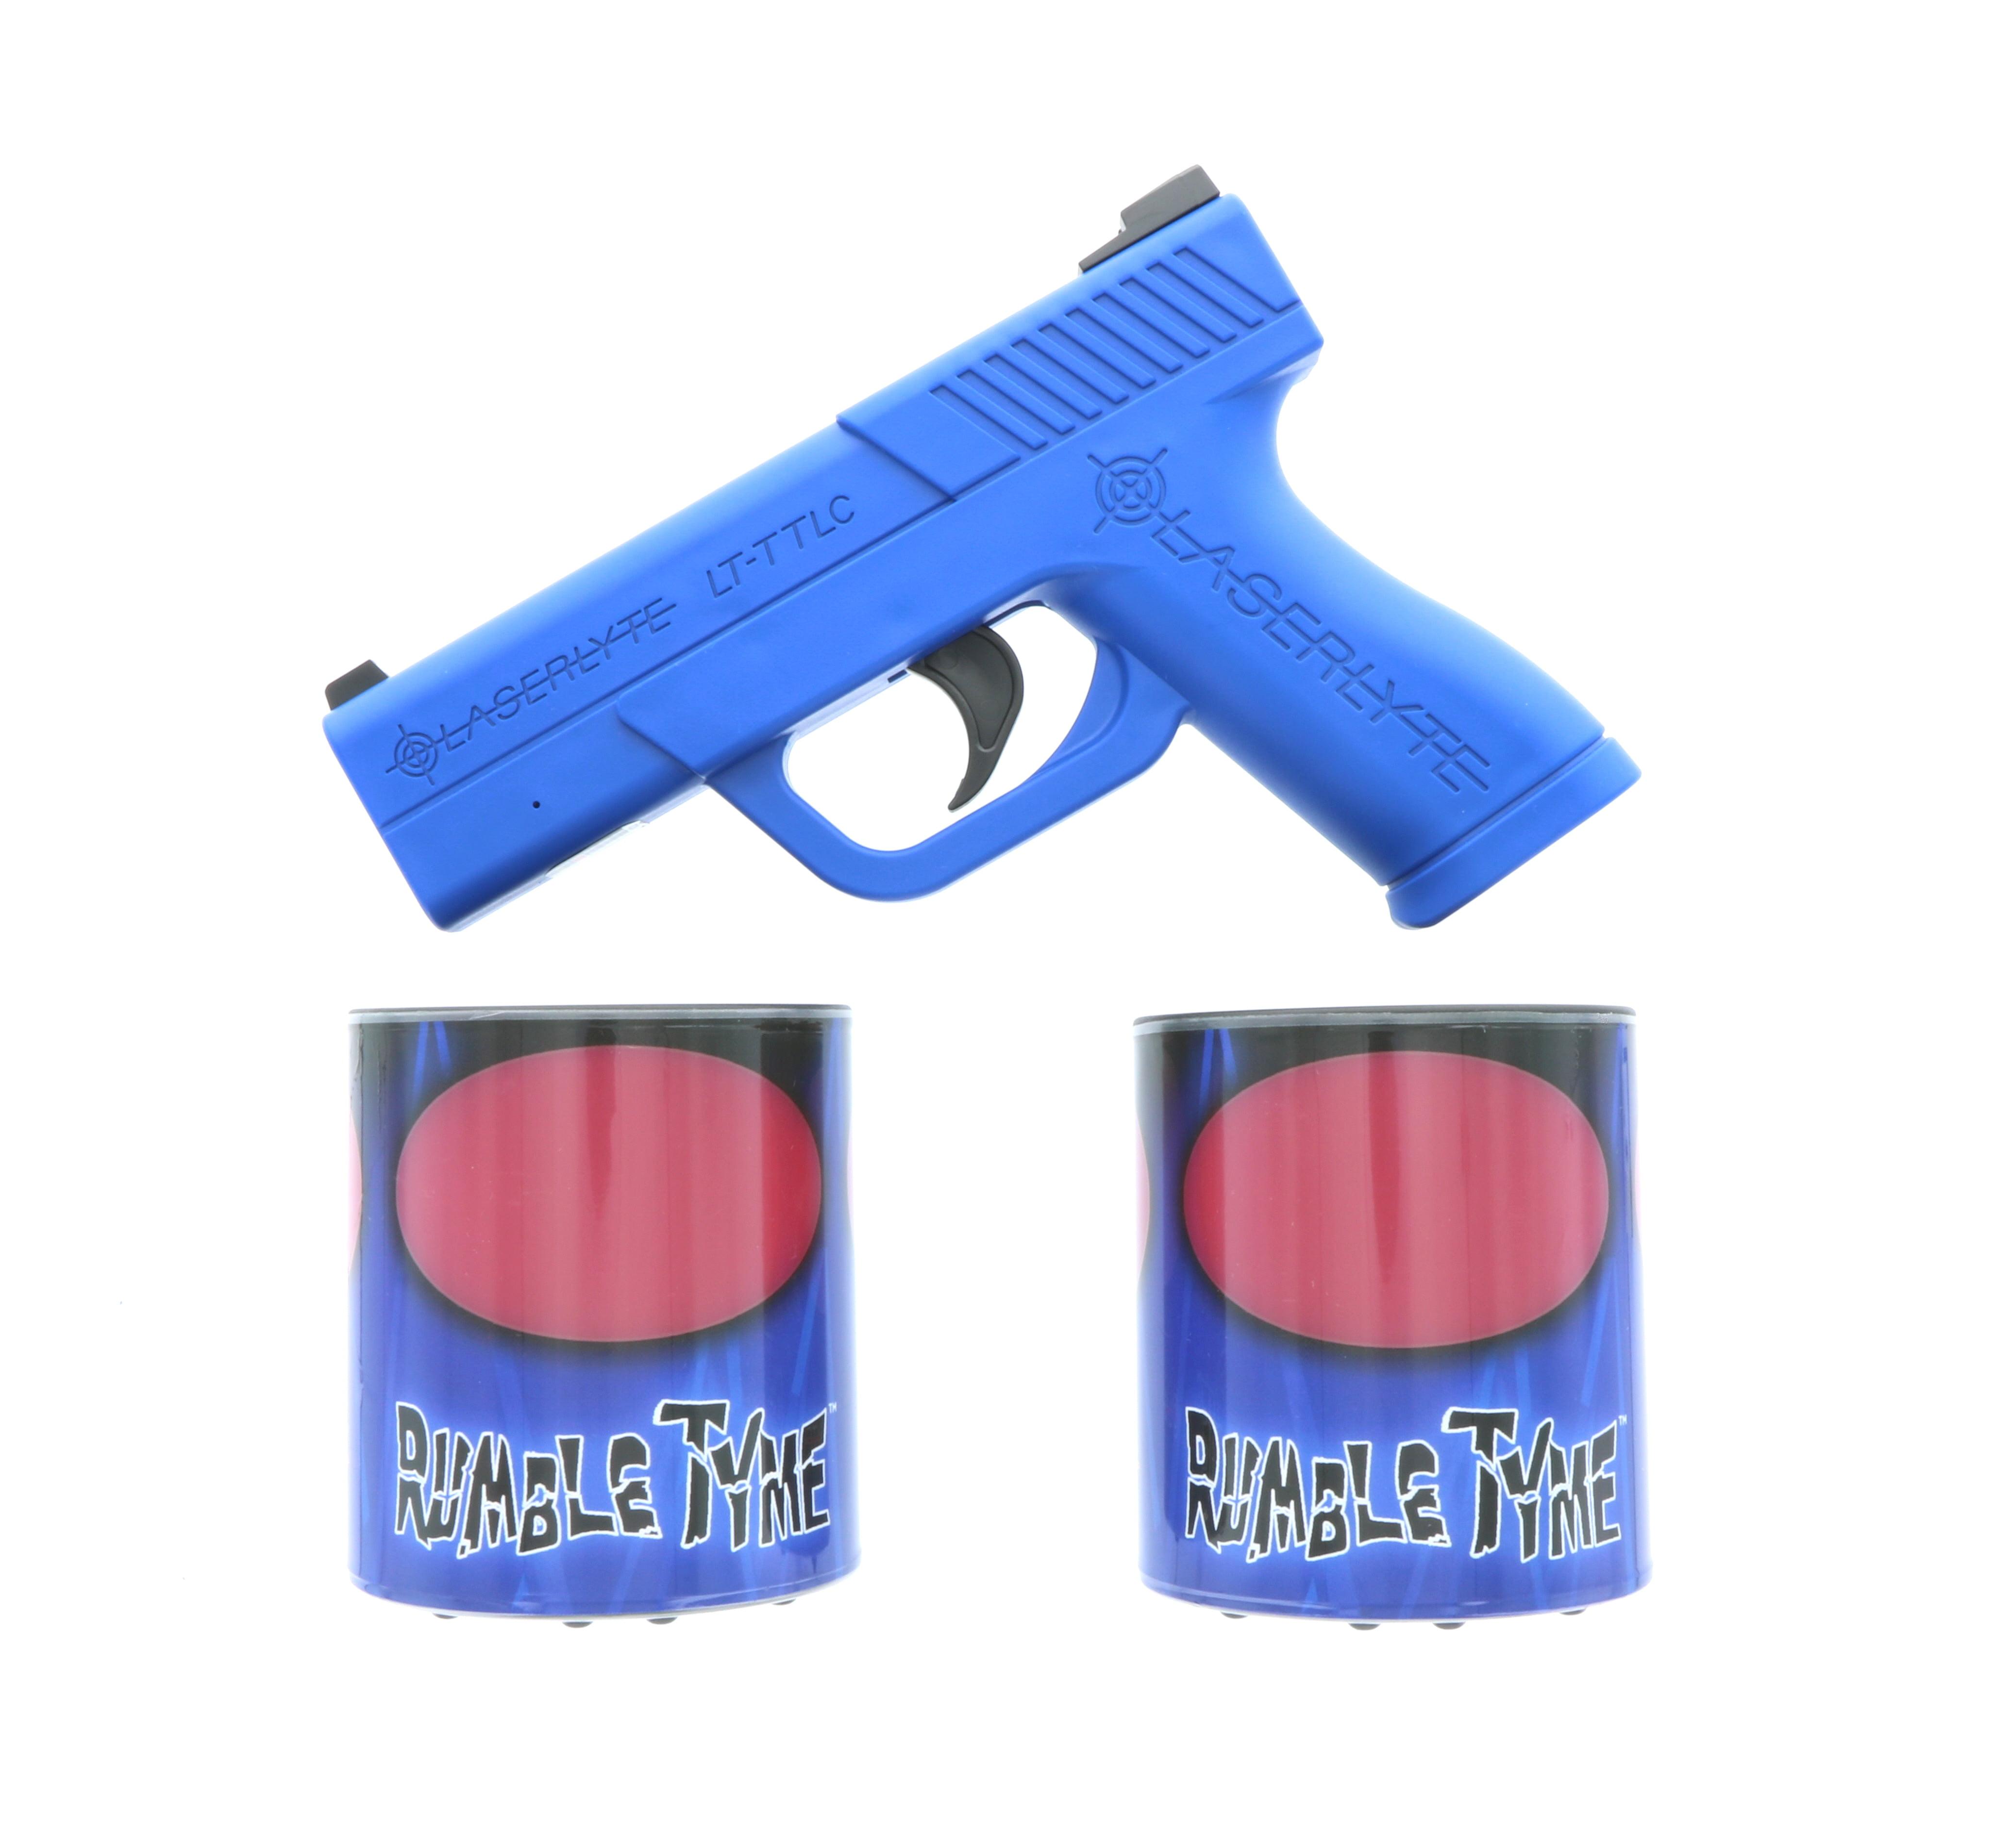 LaserLyte Laser Rumble Tyme Kit